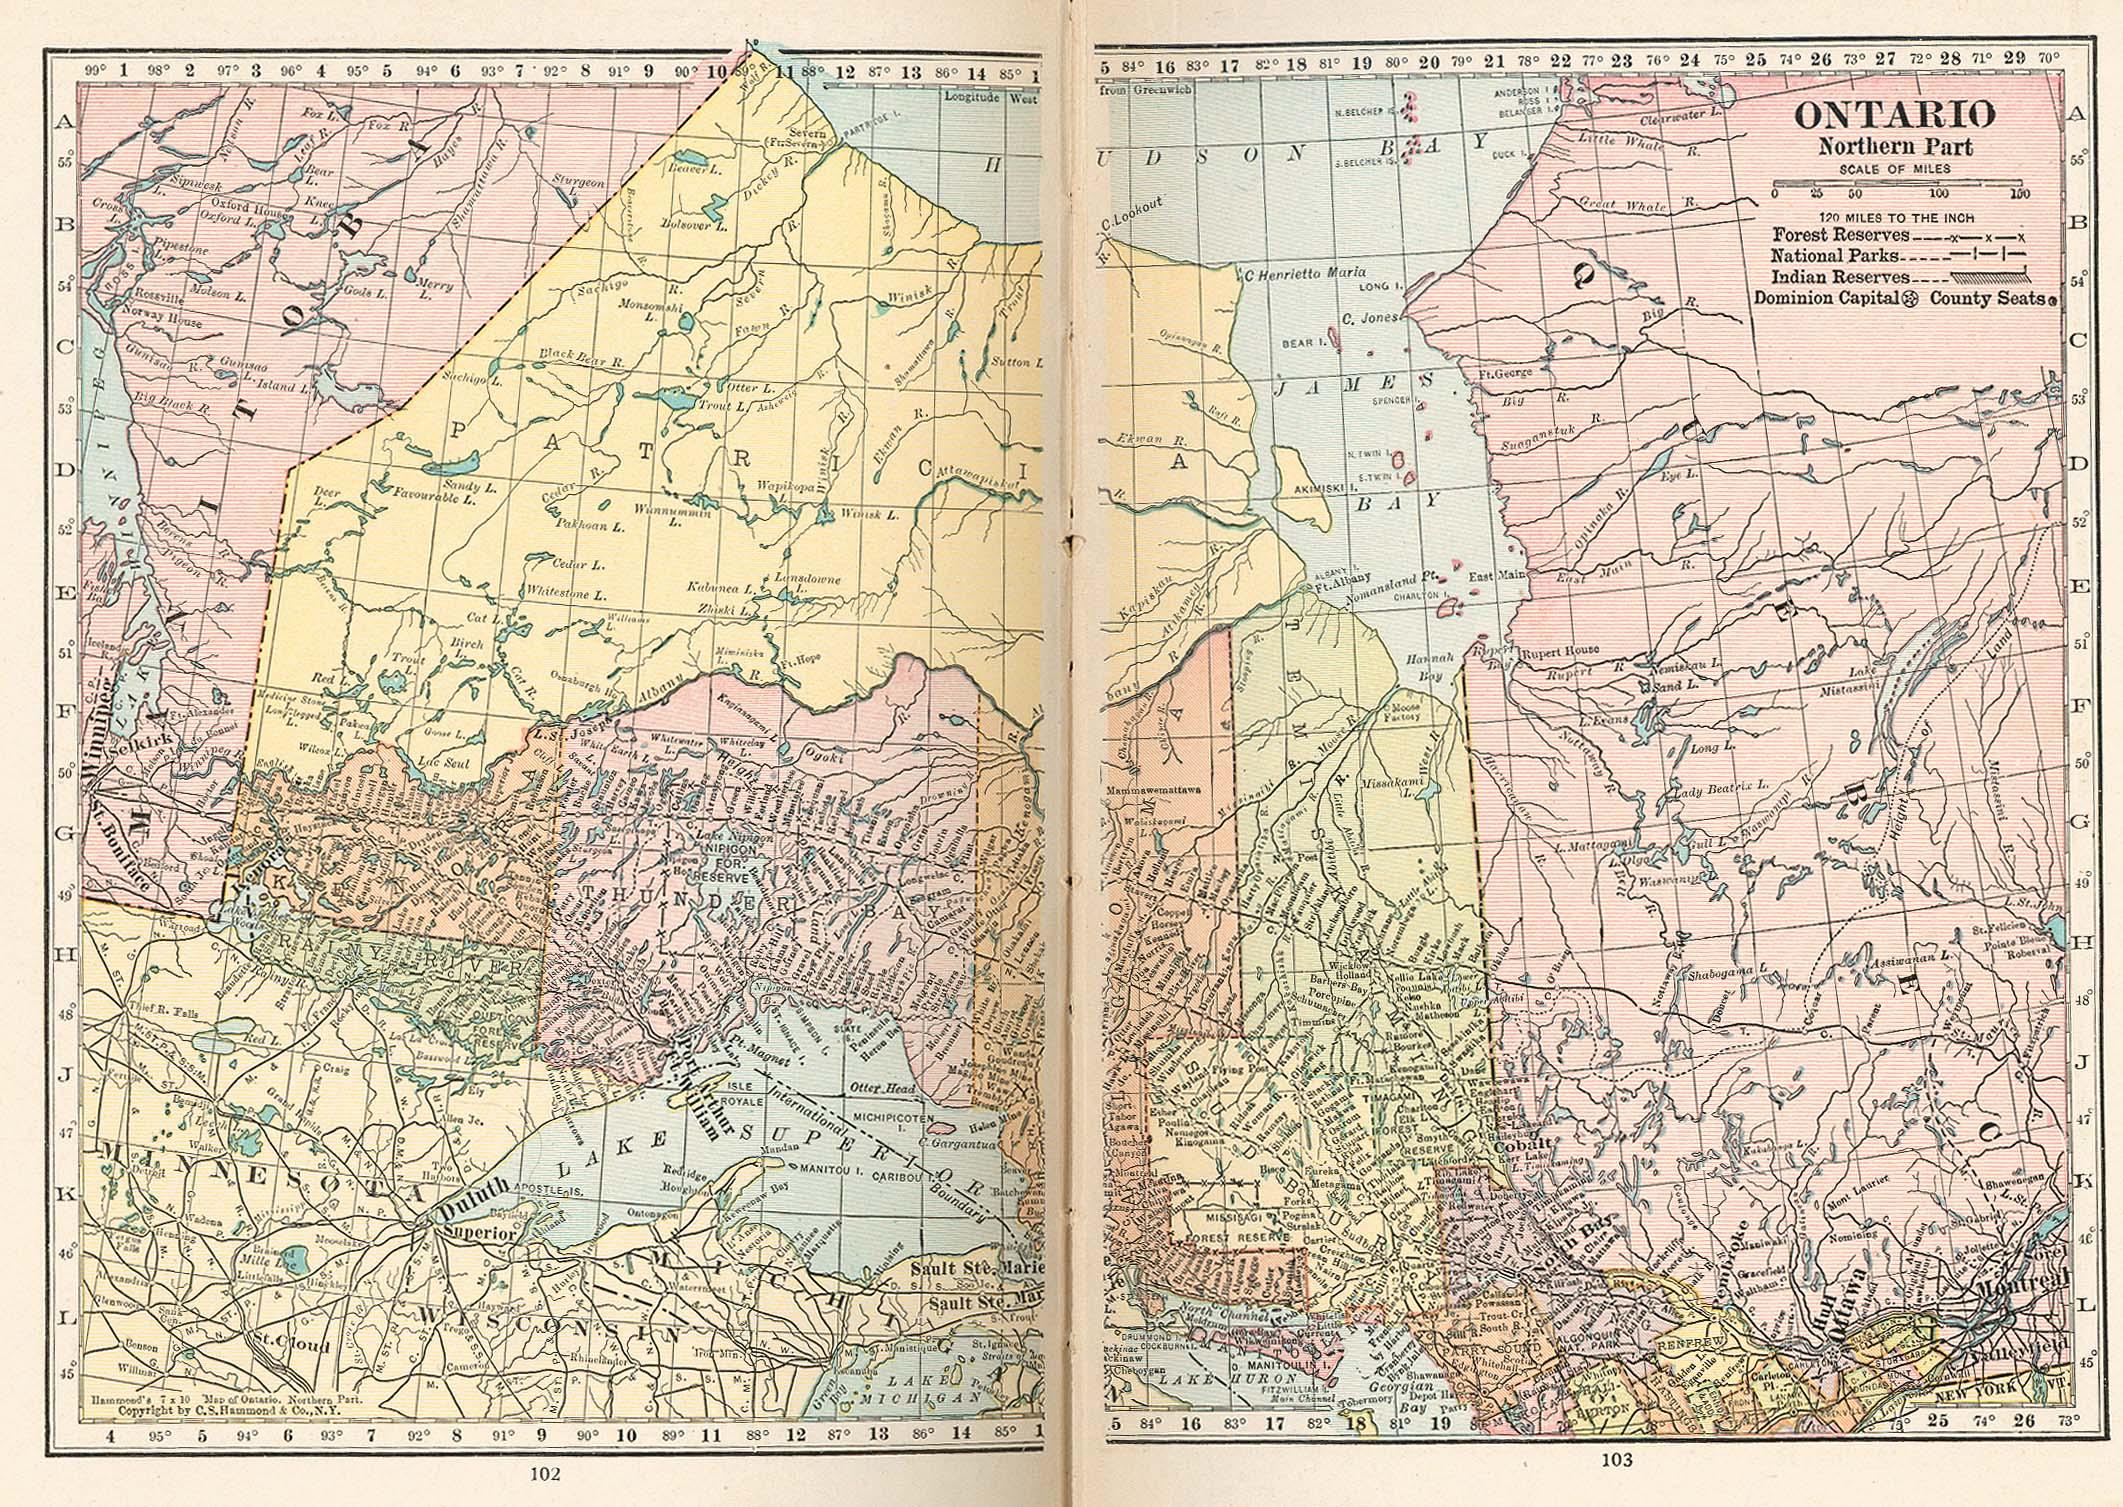 Northern Ontario Map, Canada 1921